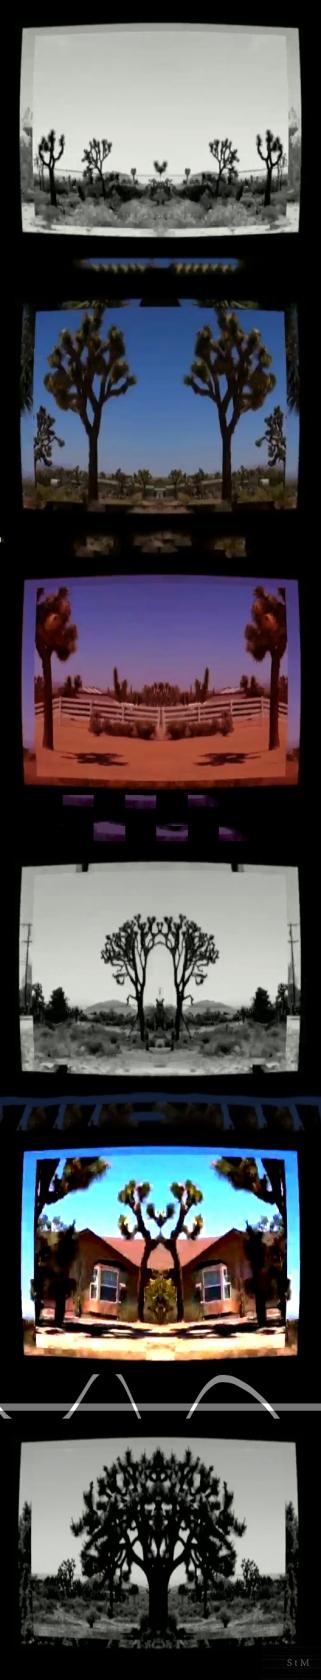 video screenshots YUCCA SNAPtheMOON